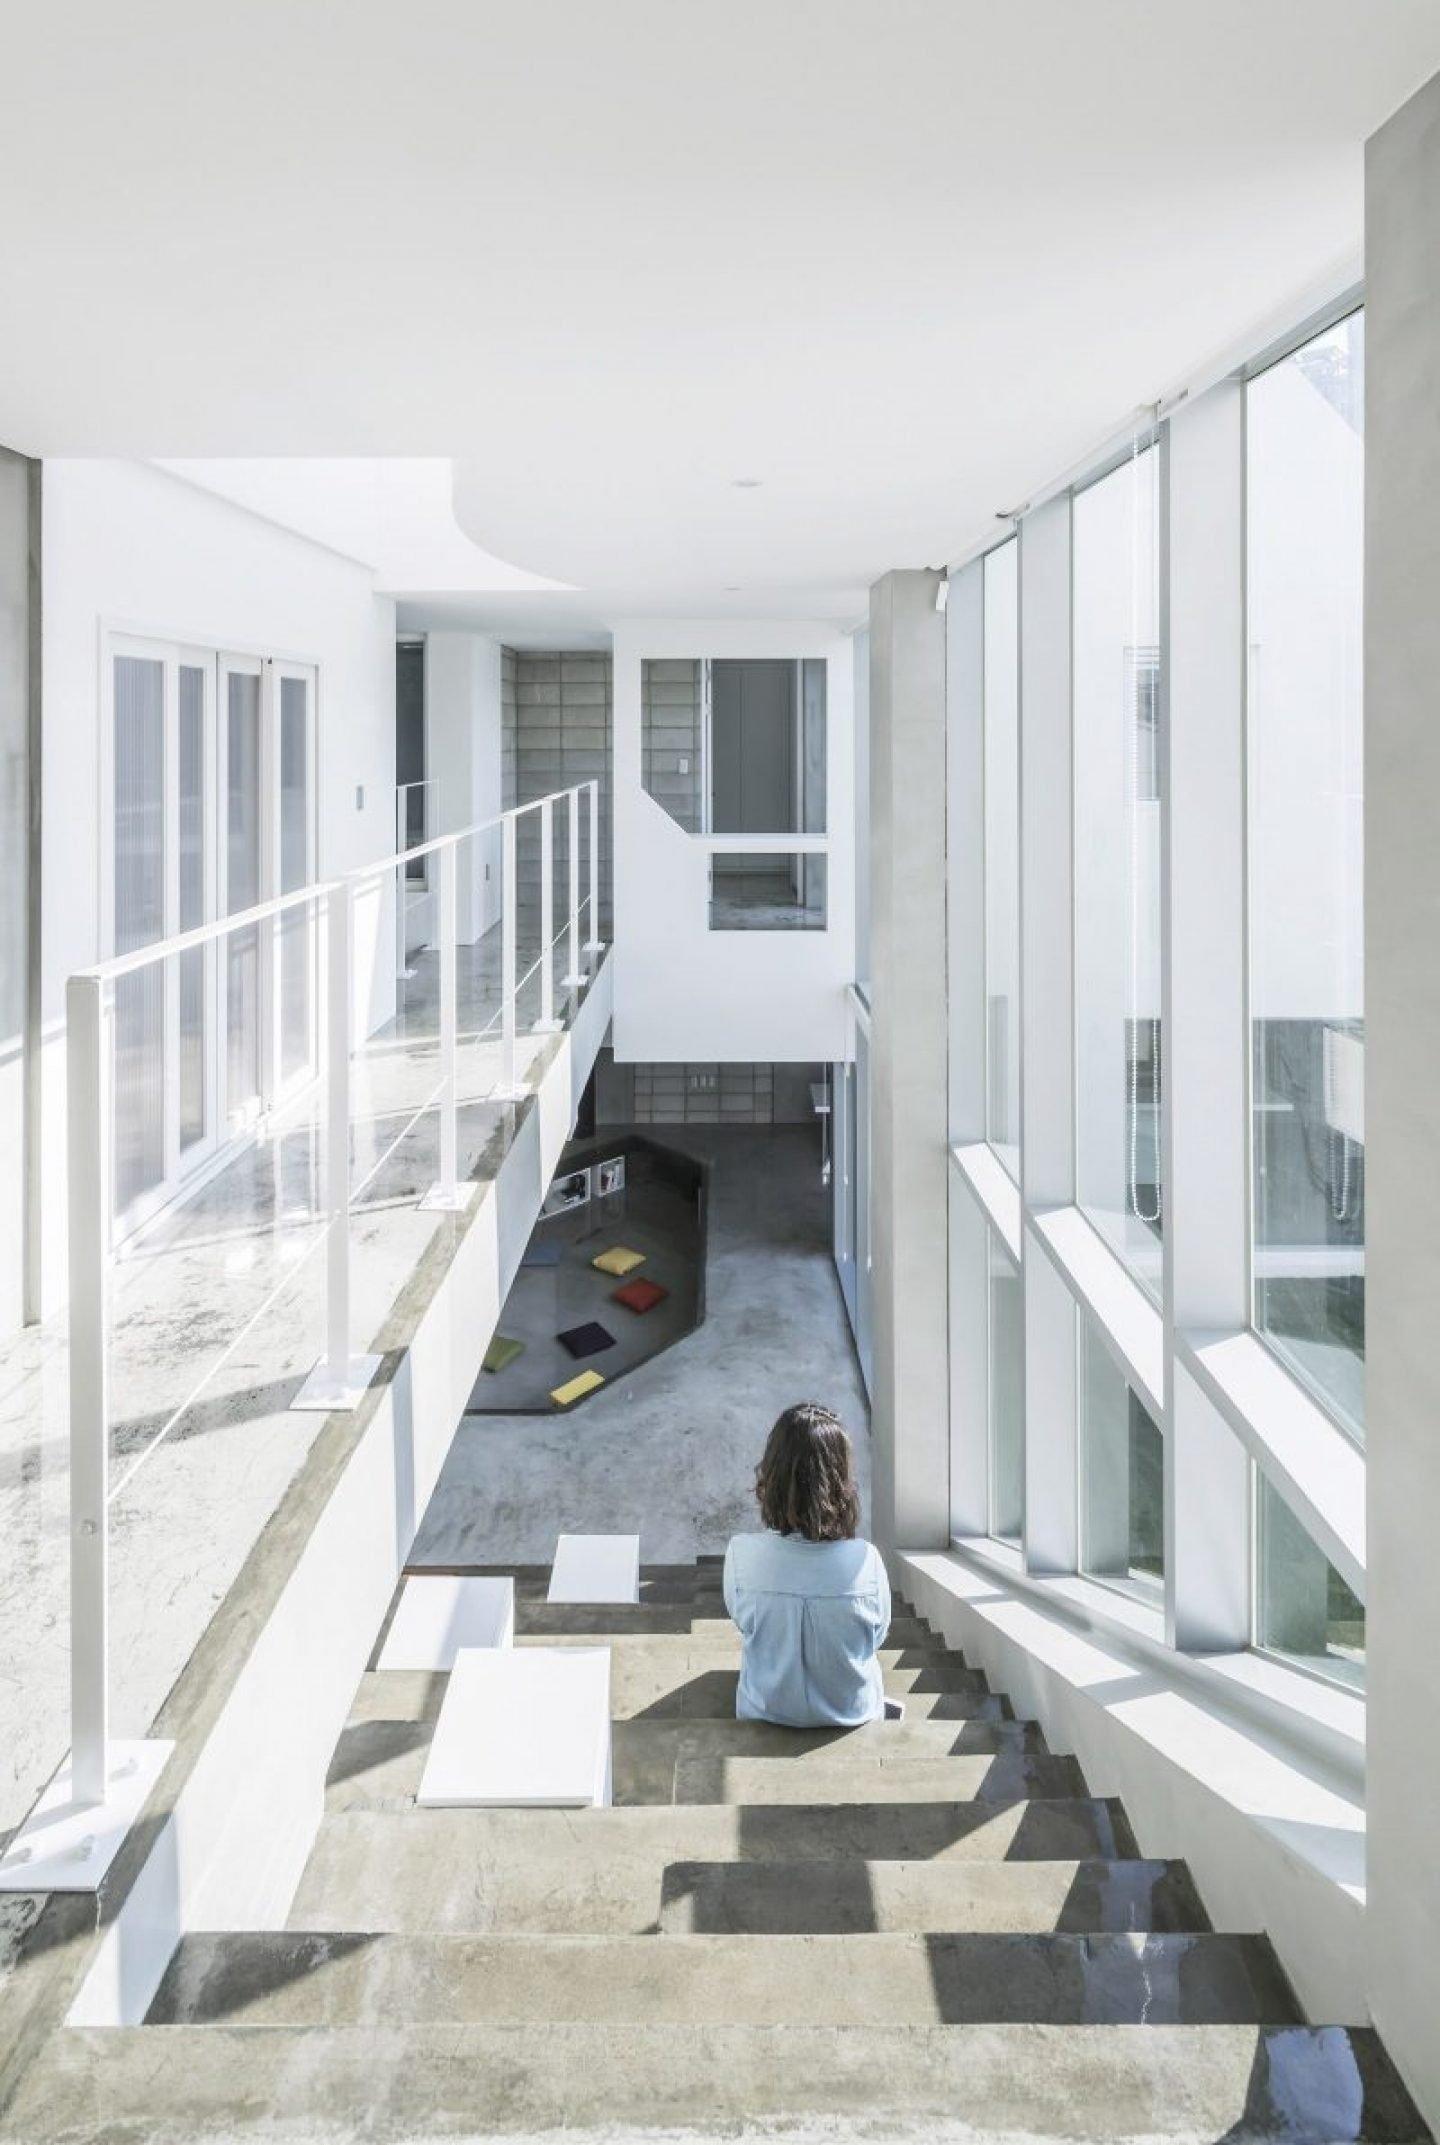 Iroje_KHM_Architecture (18)